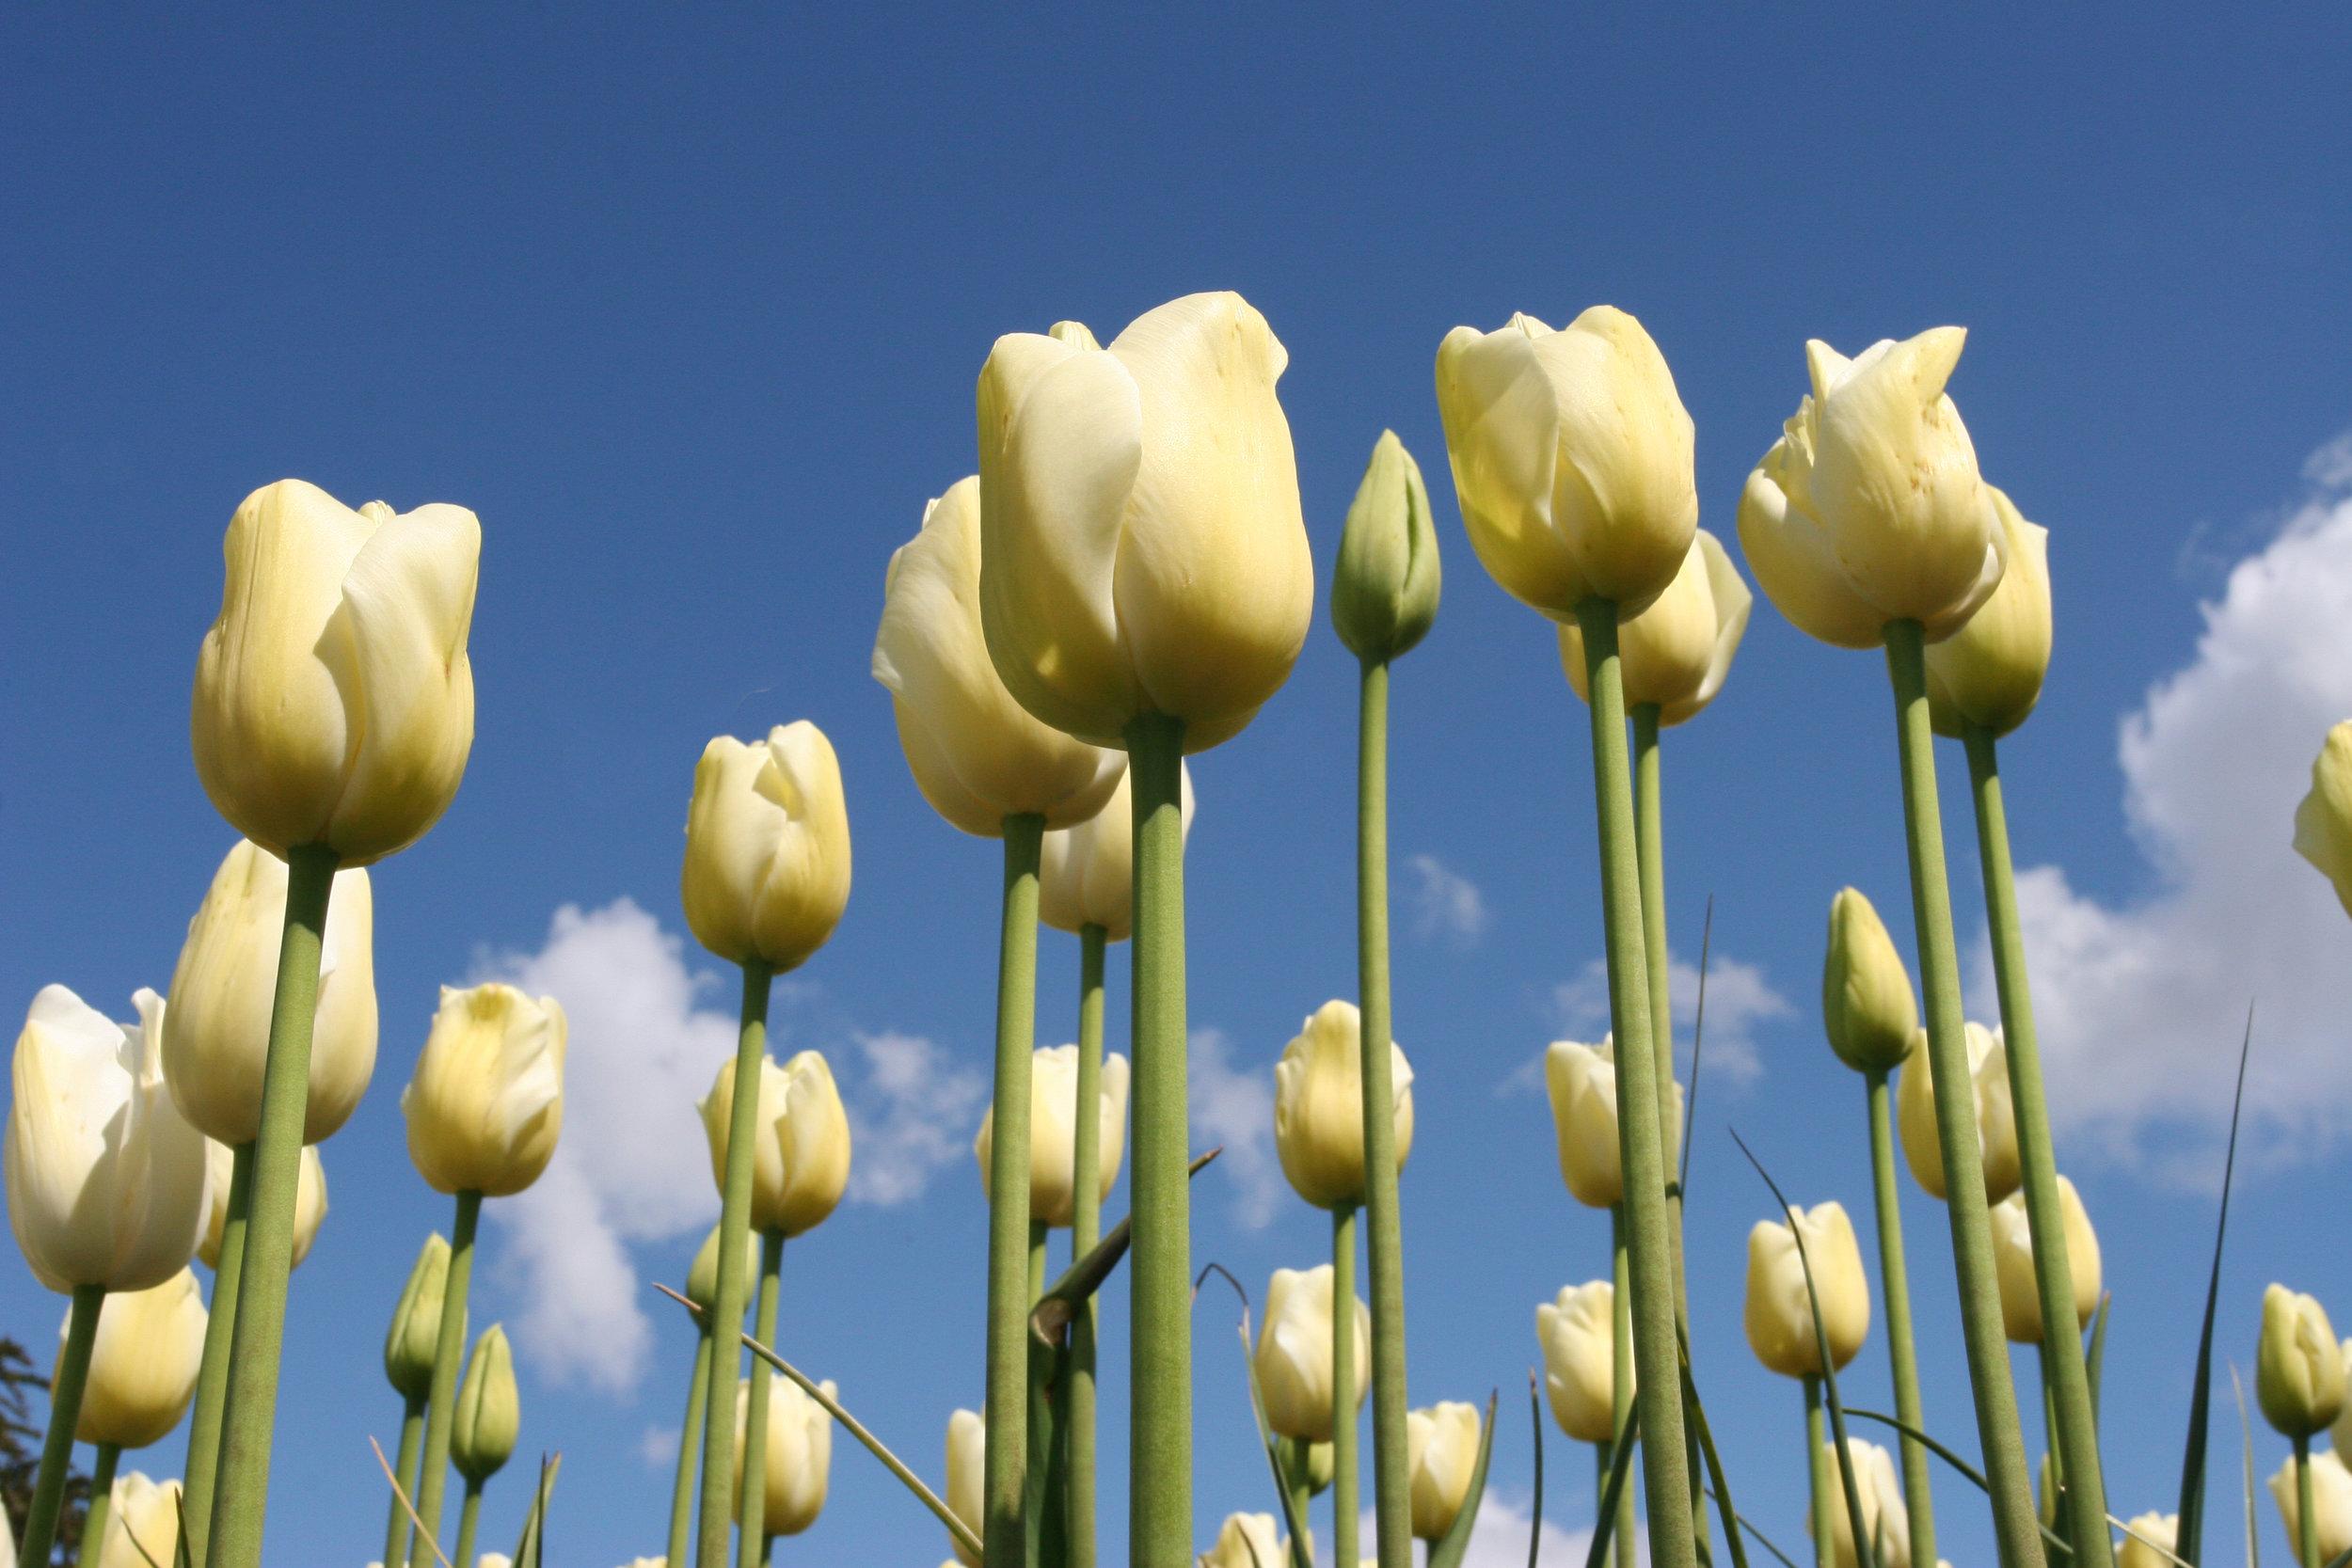 Standing Tall - Skagit Valley Tulip Festival, WA